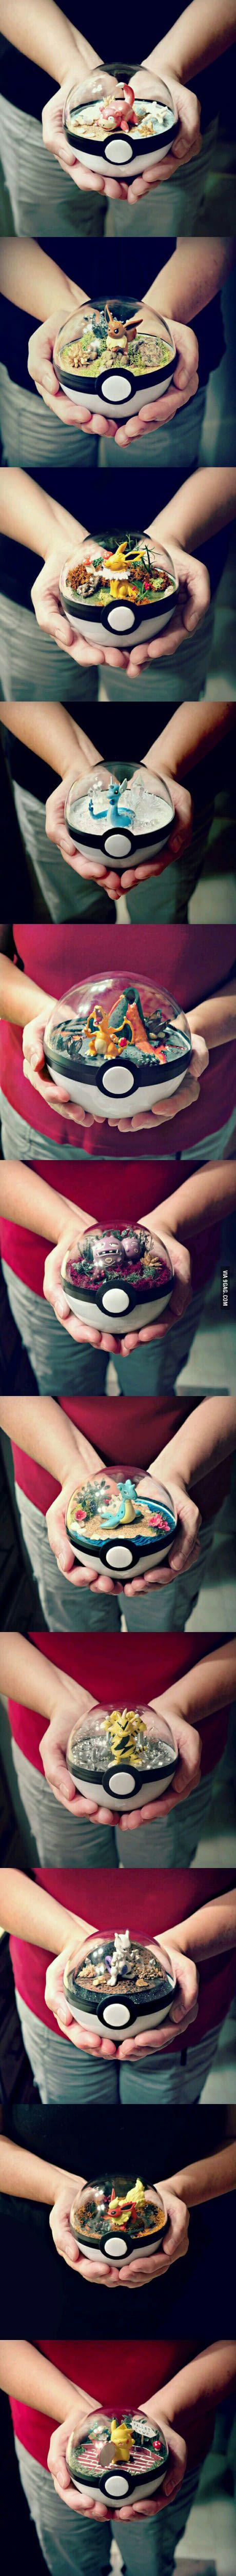 Pokemon Terrarium. You know you want it